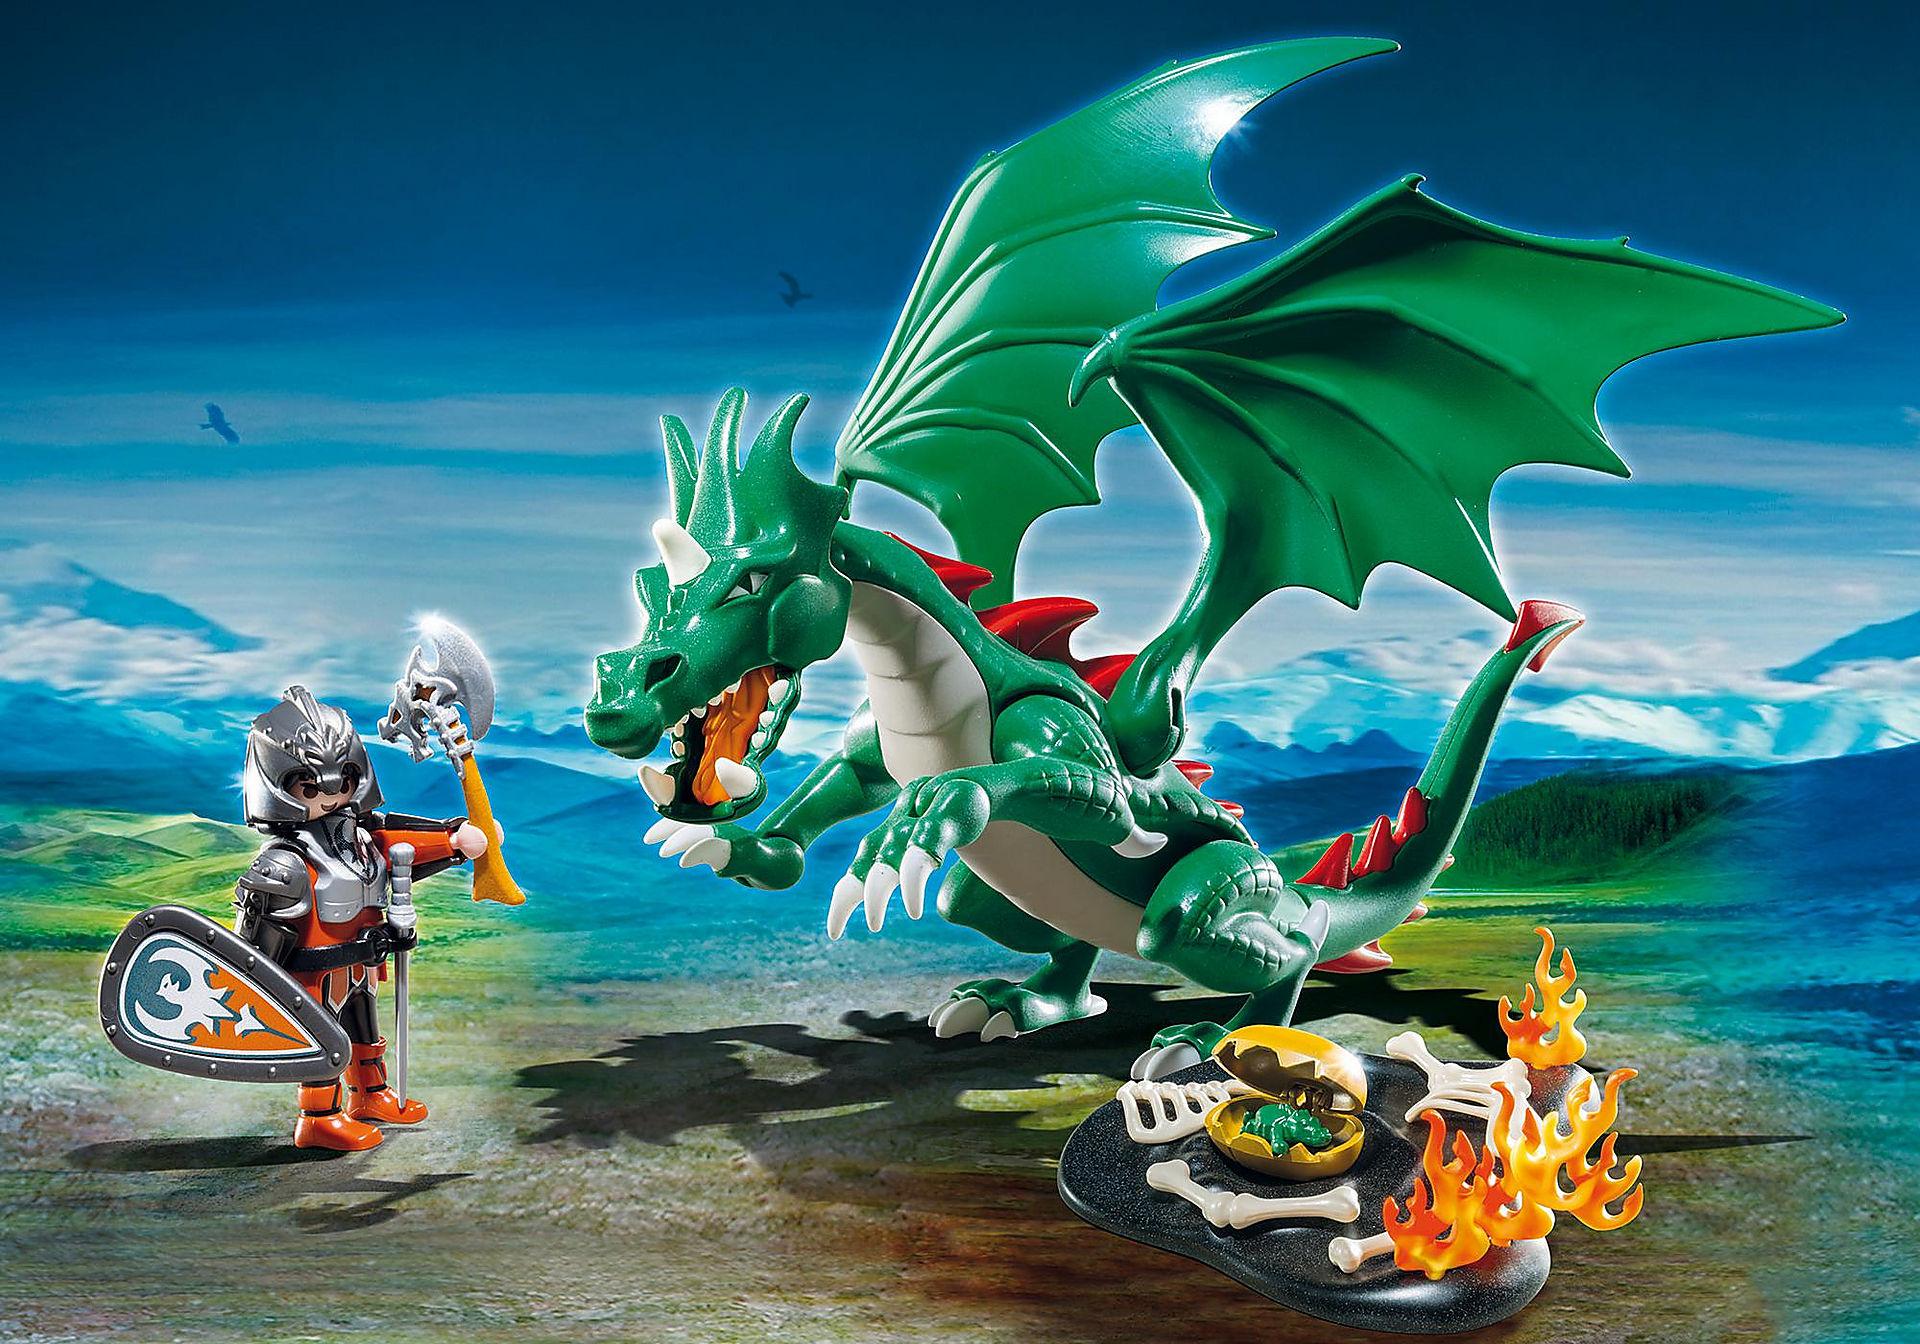 http://media.playmobil.com/i/playmobil/6003_product_detail/Großer Burgdrache